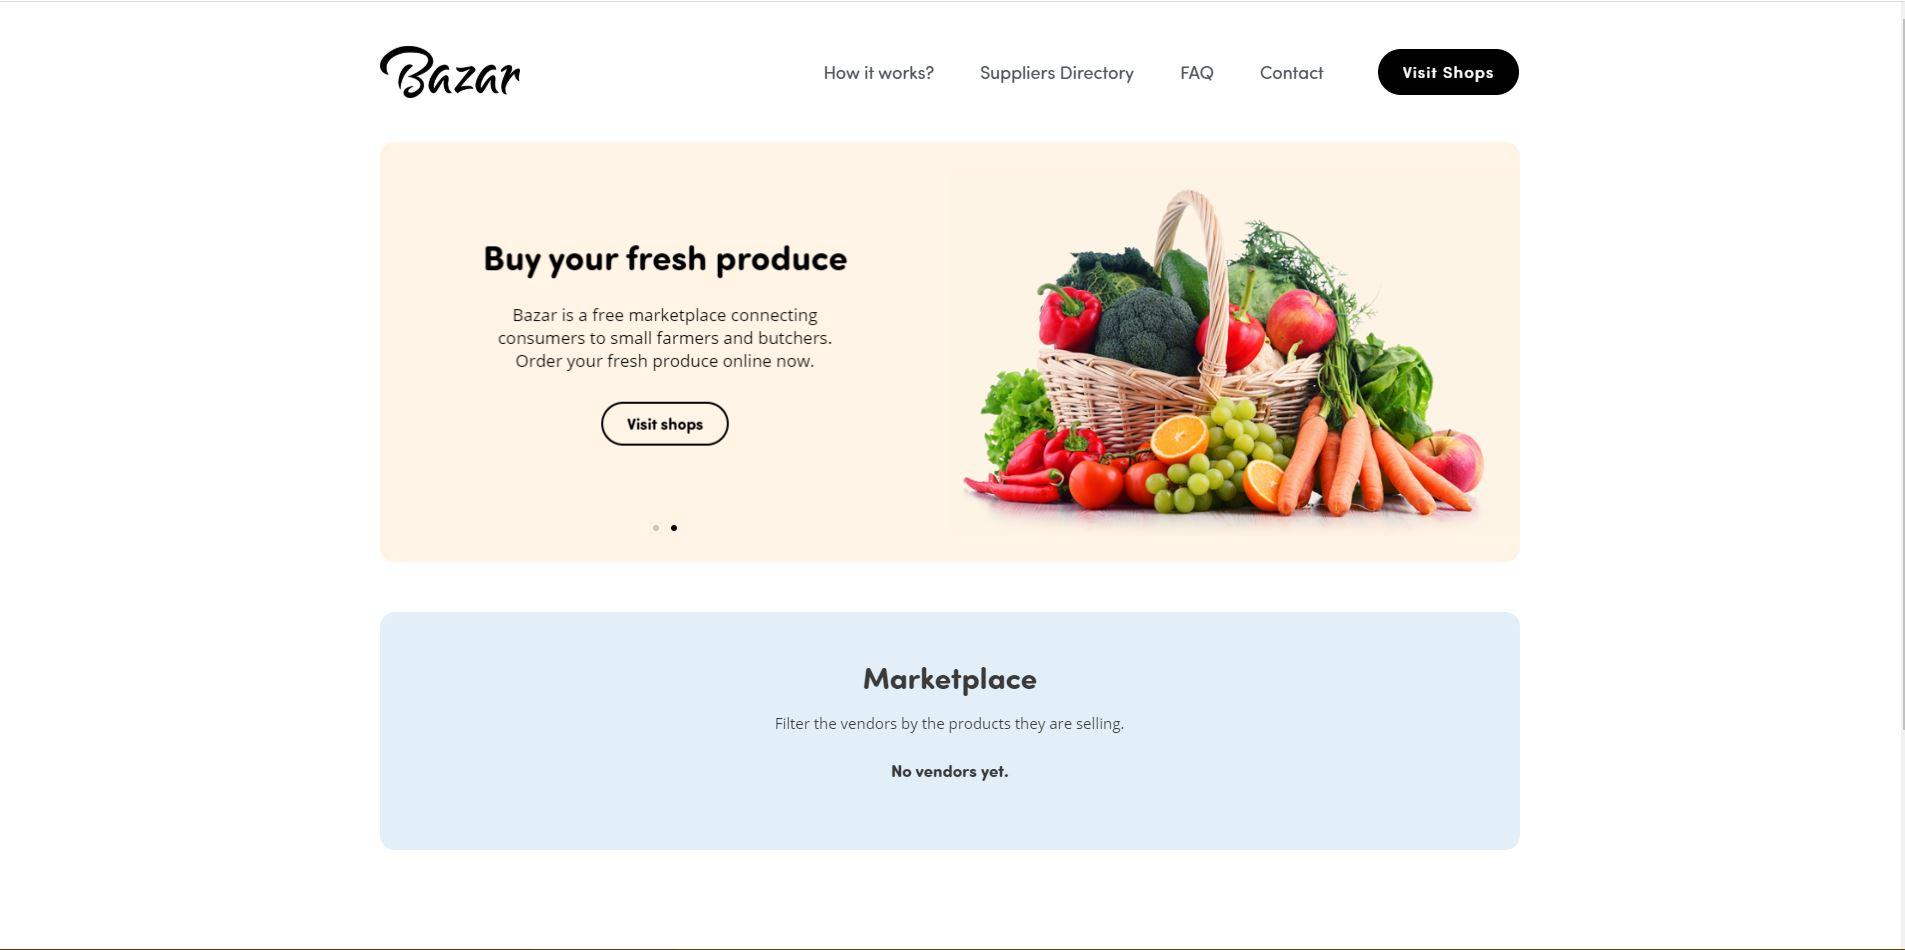 Bazar-digital-marketing-mauritius-e-commerce